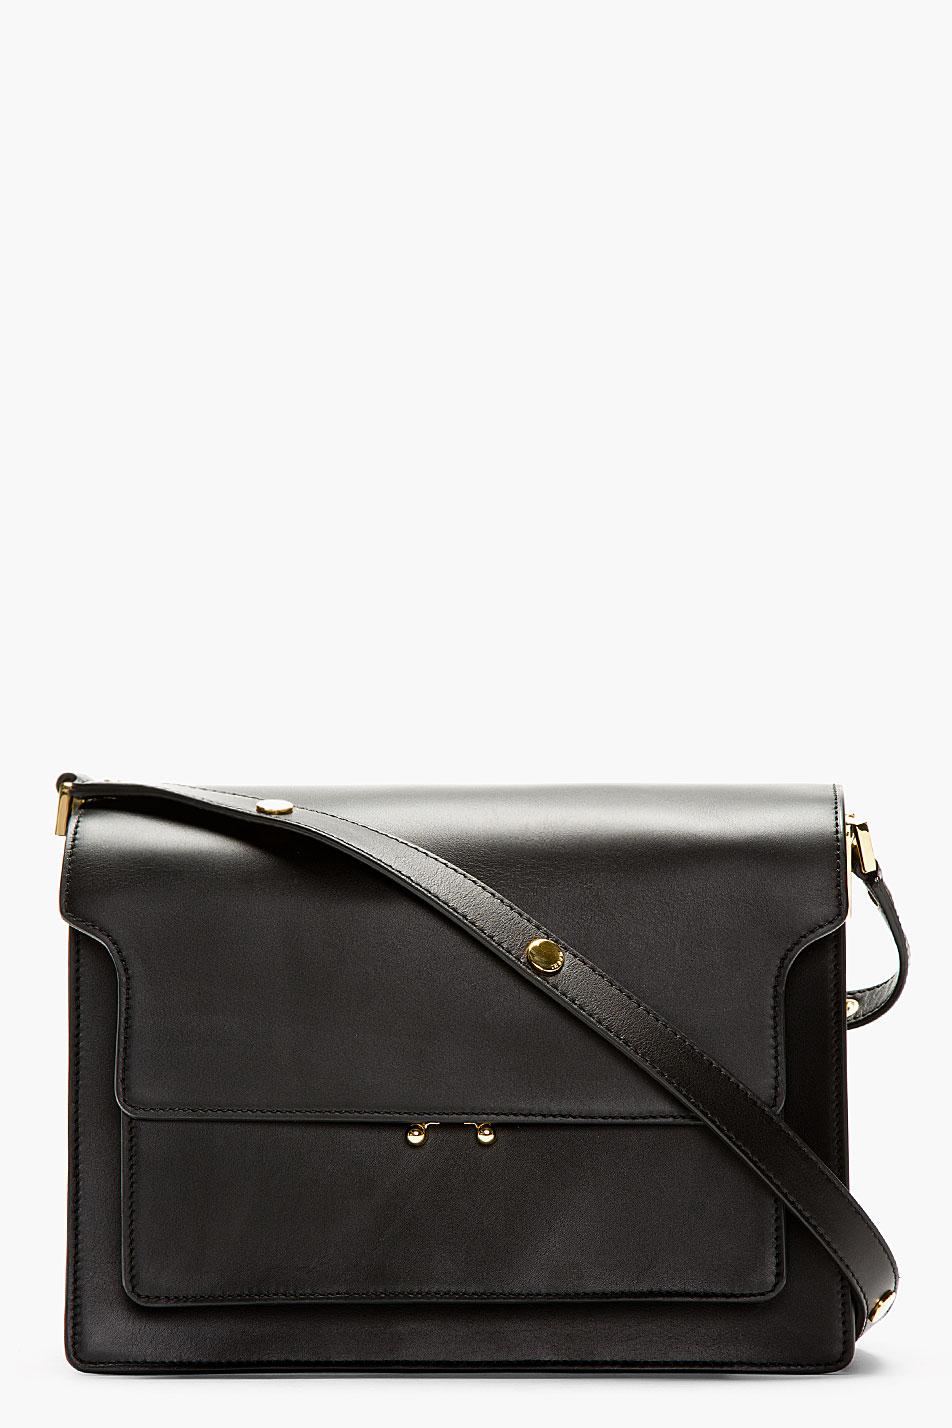 Marni Black Leather Small Shoulder Bag - Lyst